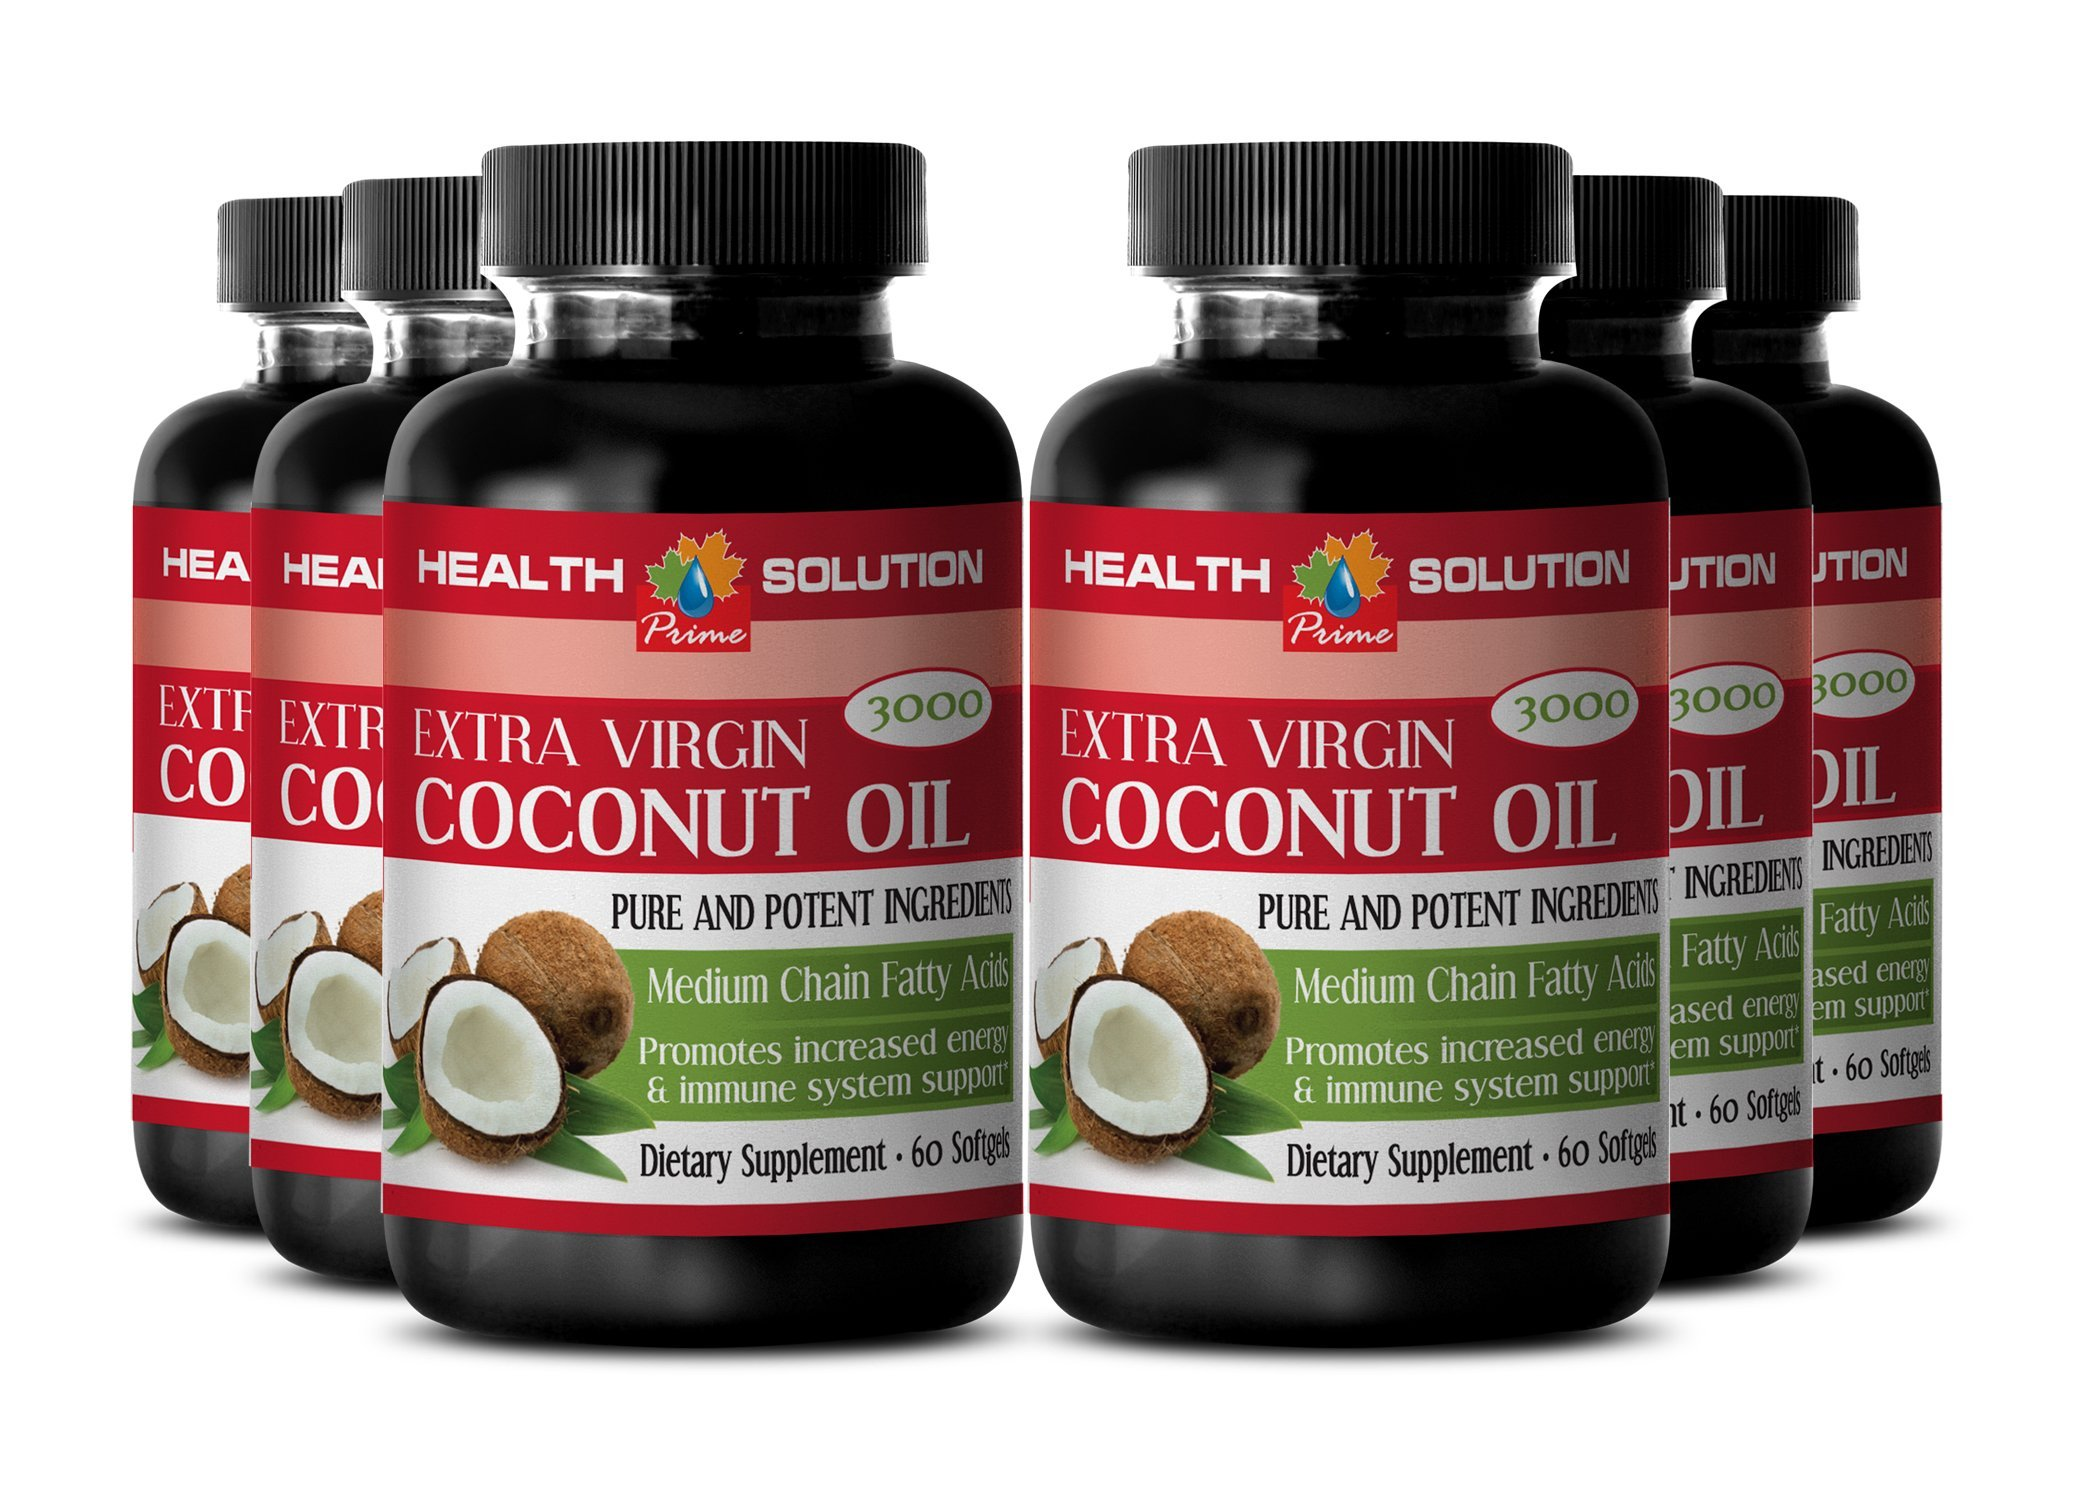 Coconut oil organic - EXTRA VIRGIN COCONUT OIL 3000 - enhance athletic performance (6 bottles)